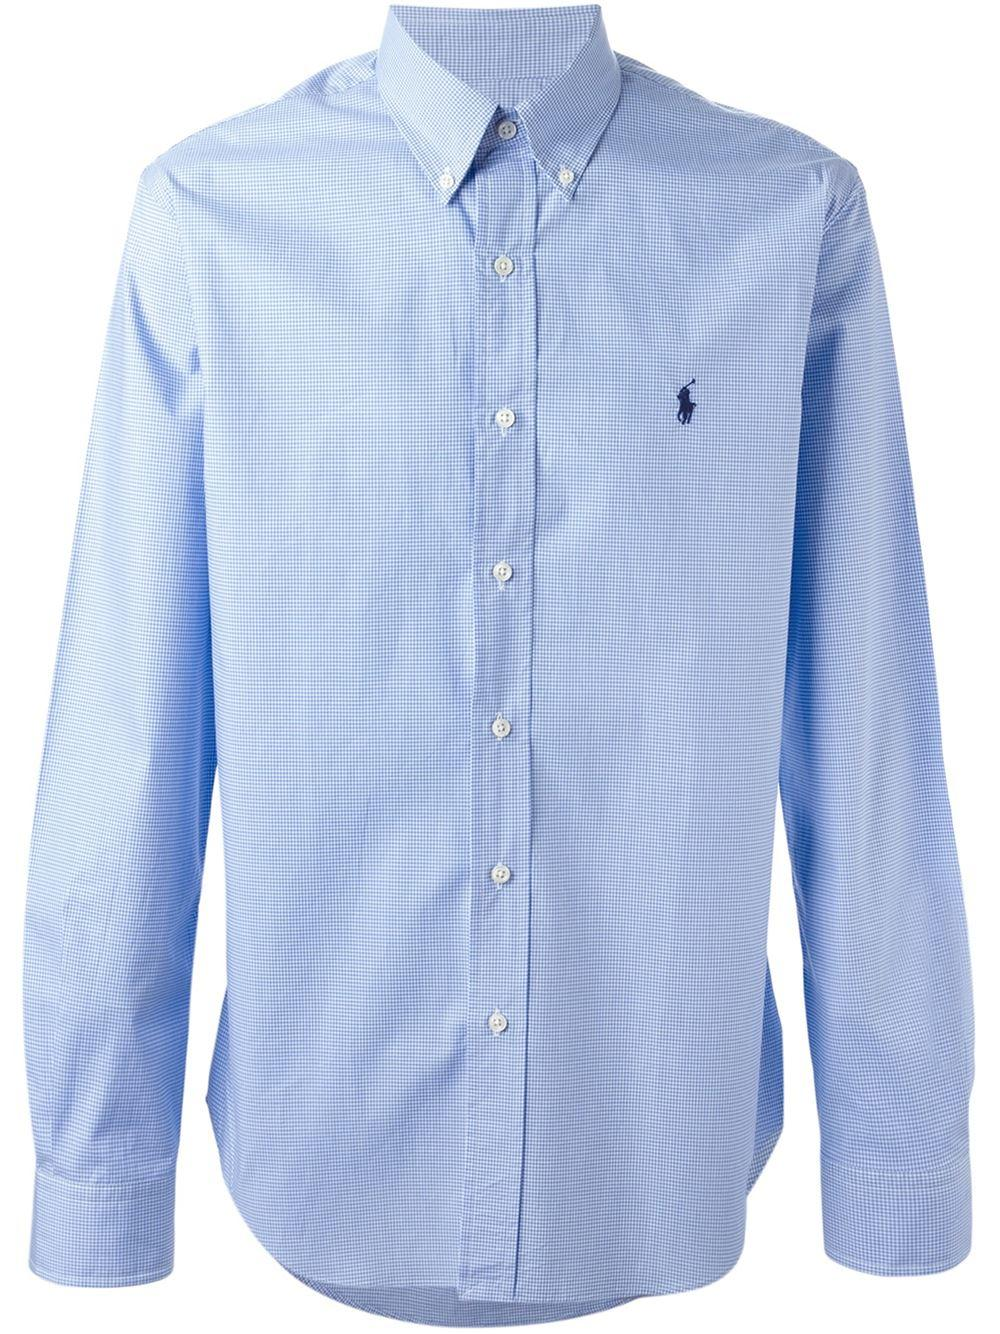 Lyst polo ralph lauren button down check shirt in blue for Polo ralph lauren casual button down shirts